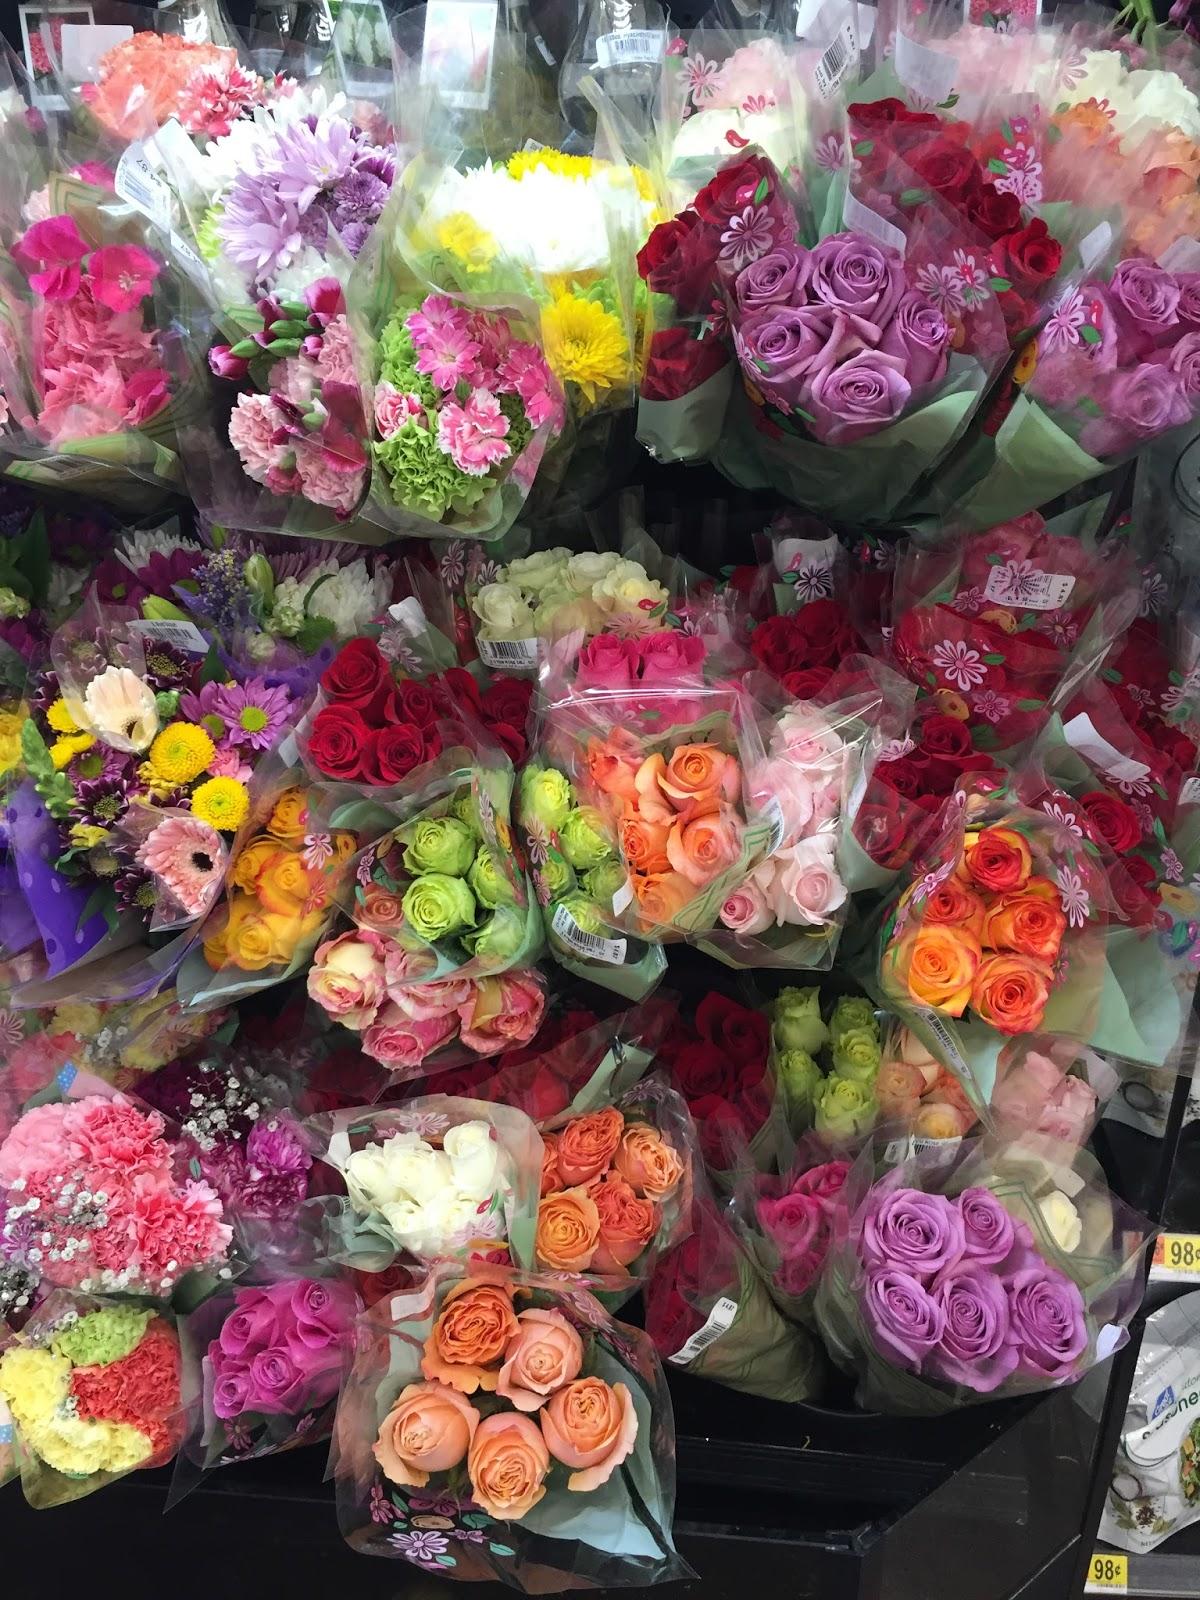 Silk Flowers Walmart Image collections - Fresh Lotus Flowers